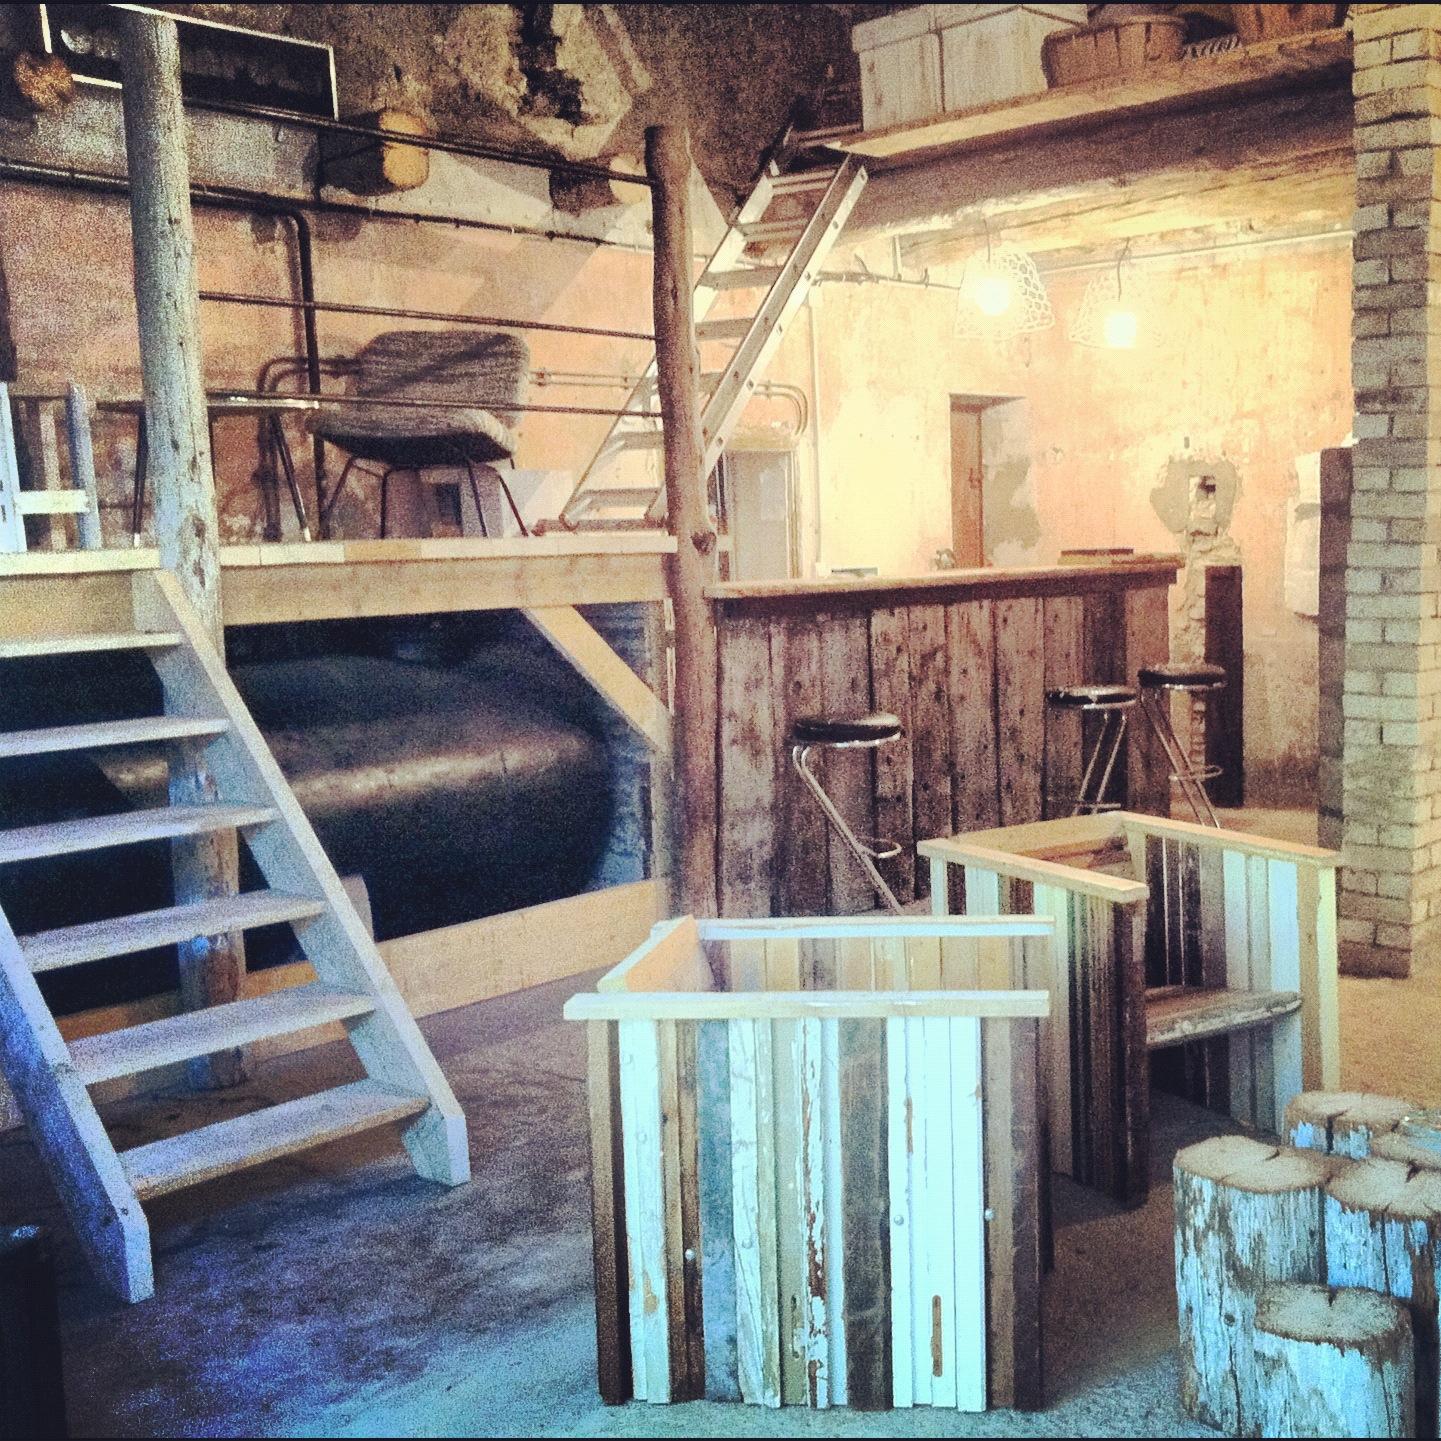 location d atelier d artiste salle d exposition marrel. Black Bedroom Furniture Sets. Home Design Ideas